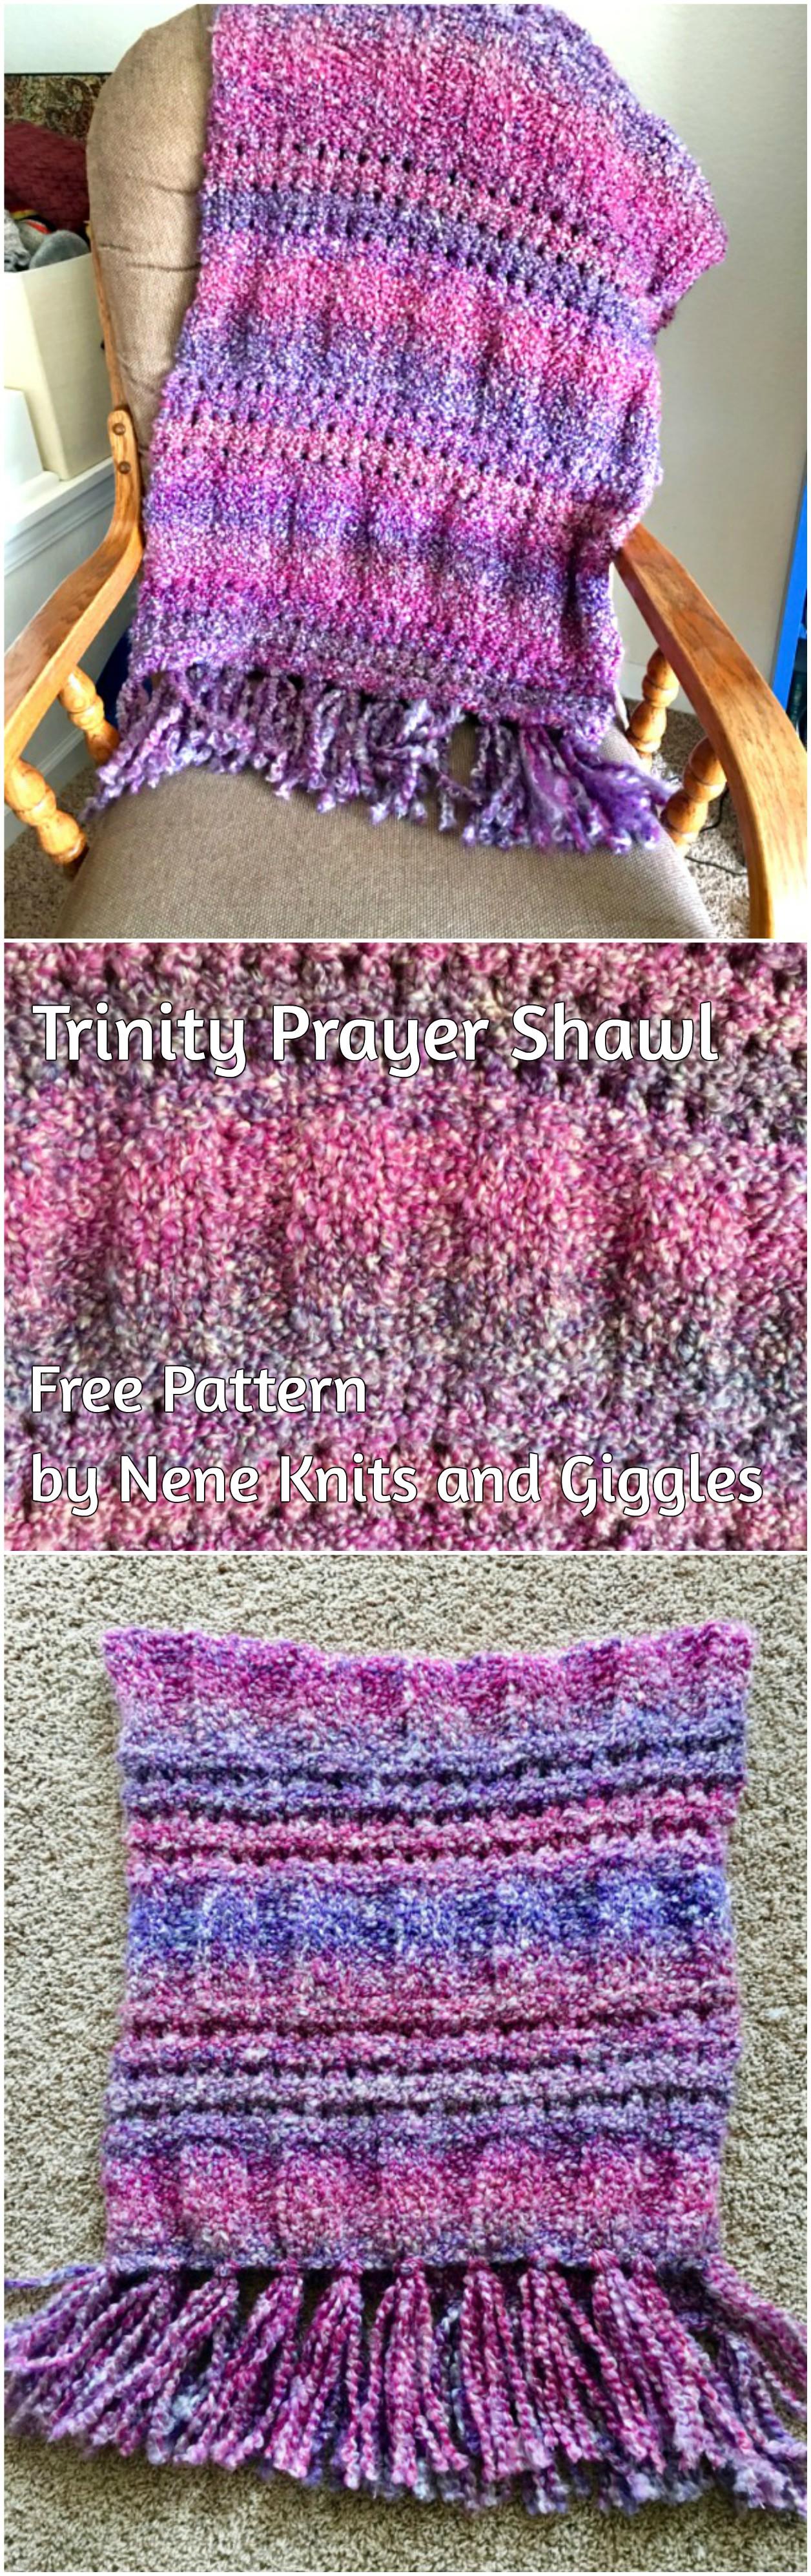 The Trinity Prayer Shawl: free knitting pattern using super bulky ...